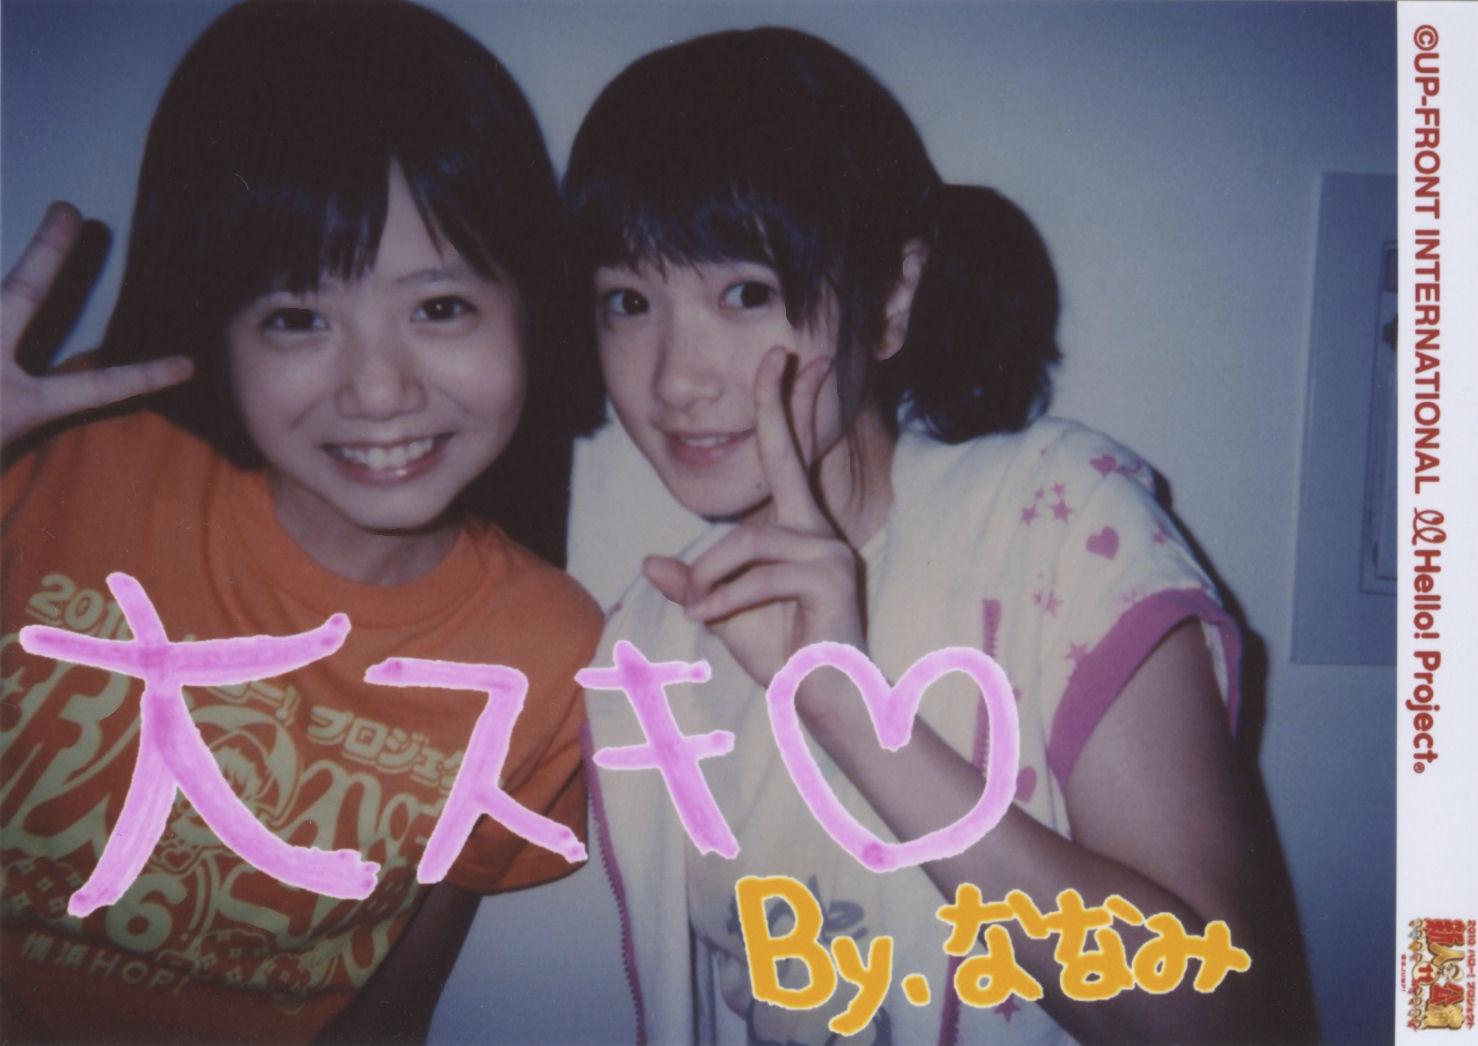 【Juice=Juice】宮本佳林応援スレPart.436【大天使】 YouTube動画>7本 ->画像>327枚